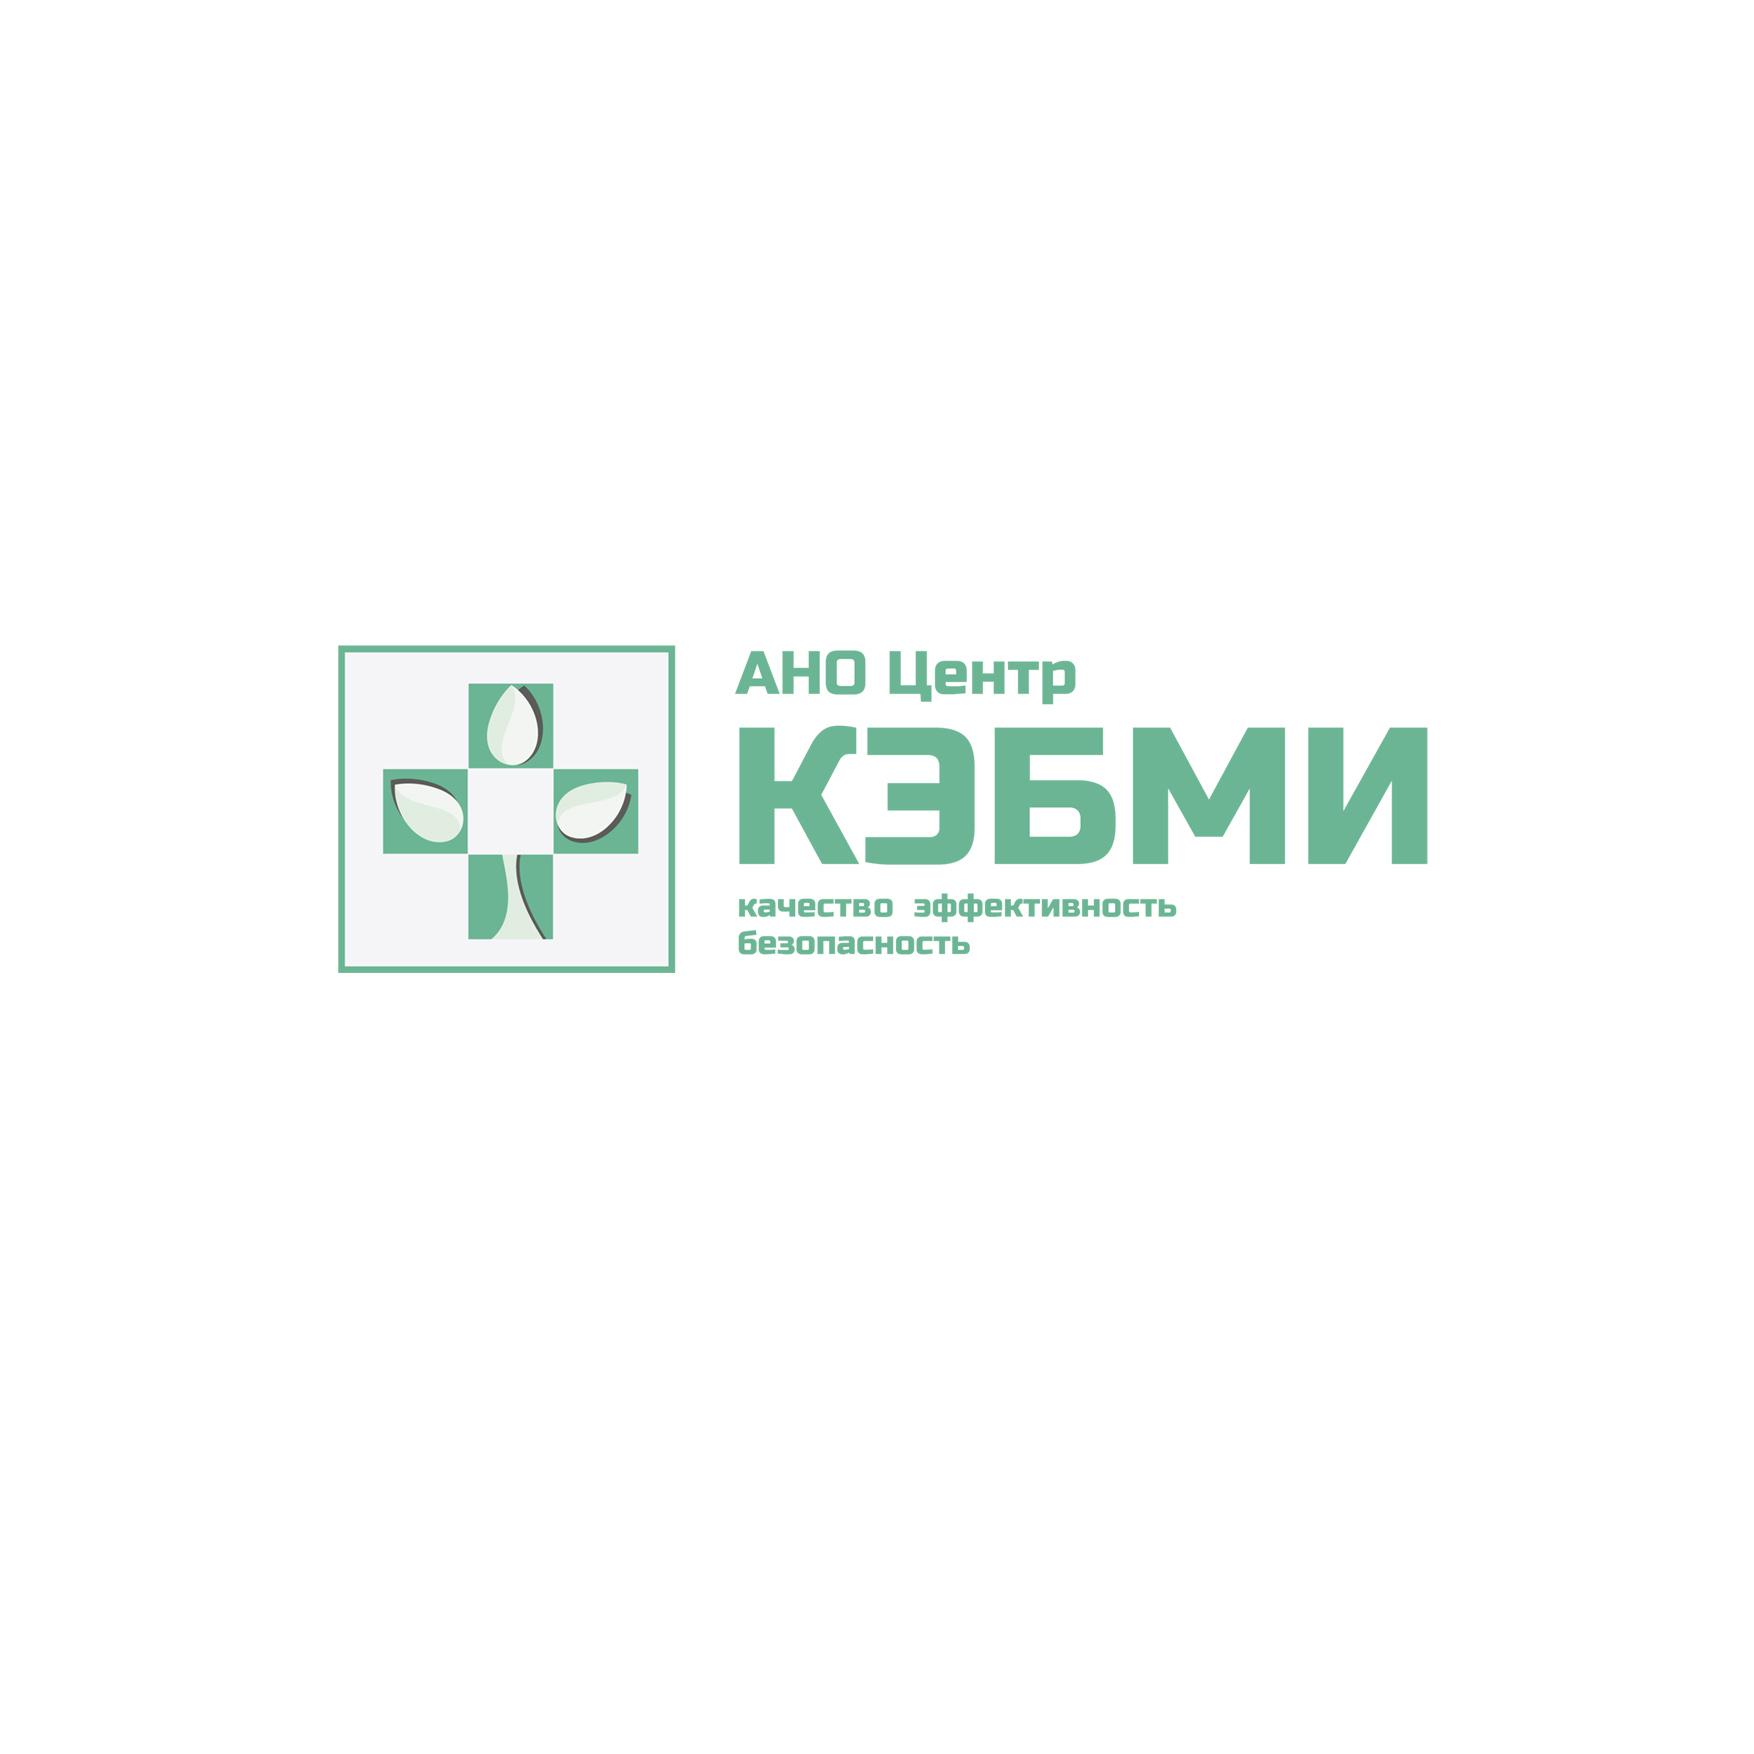 Редизайн логотипа АНО Центр КЭБМИ - BREVIS фото f_8825b296765ae579.jpg